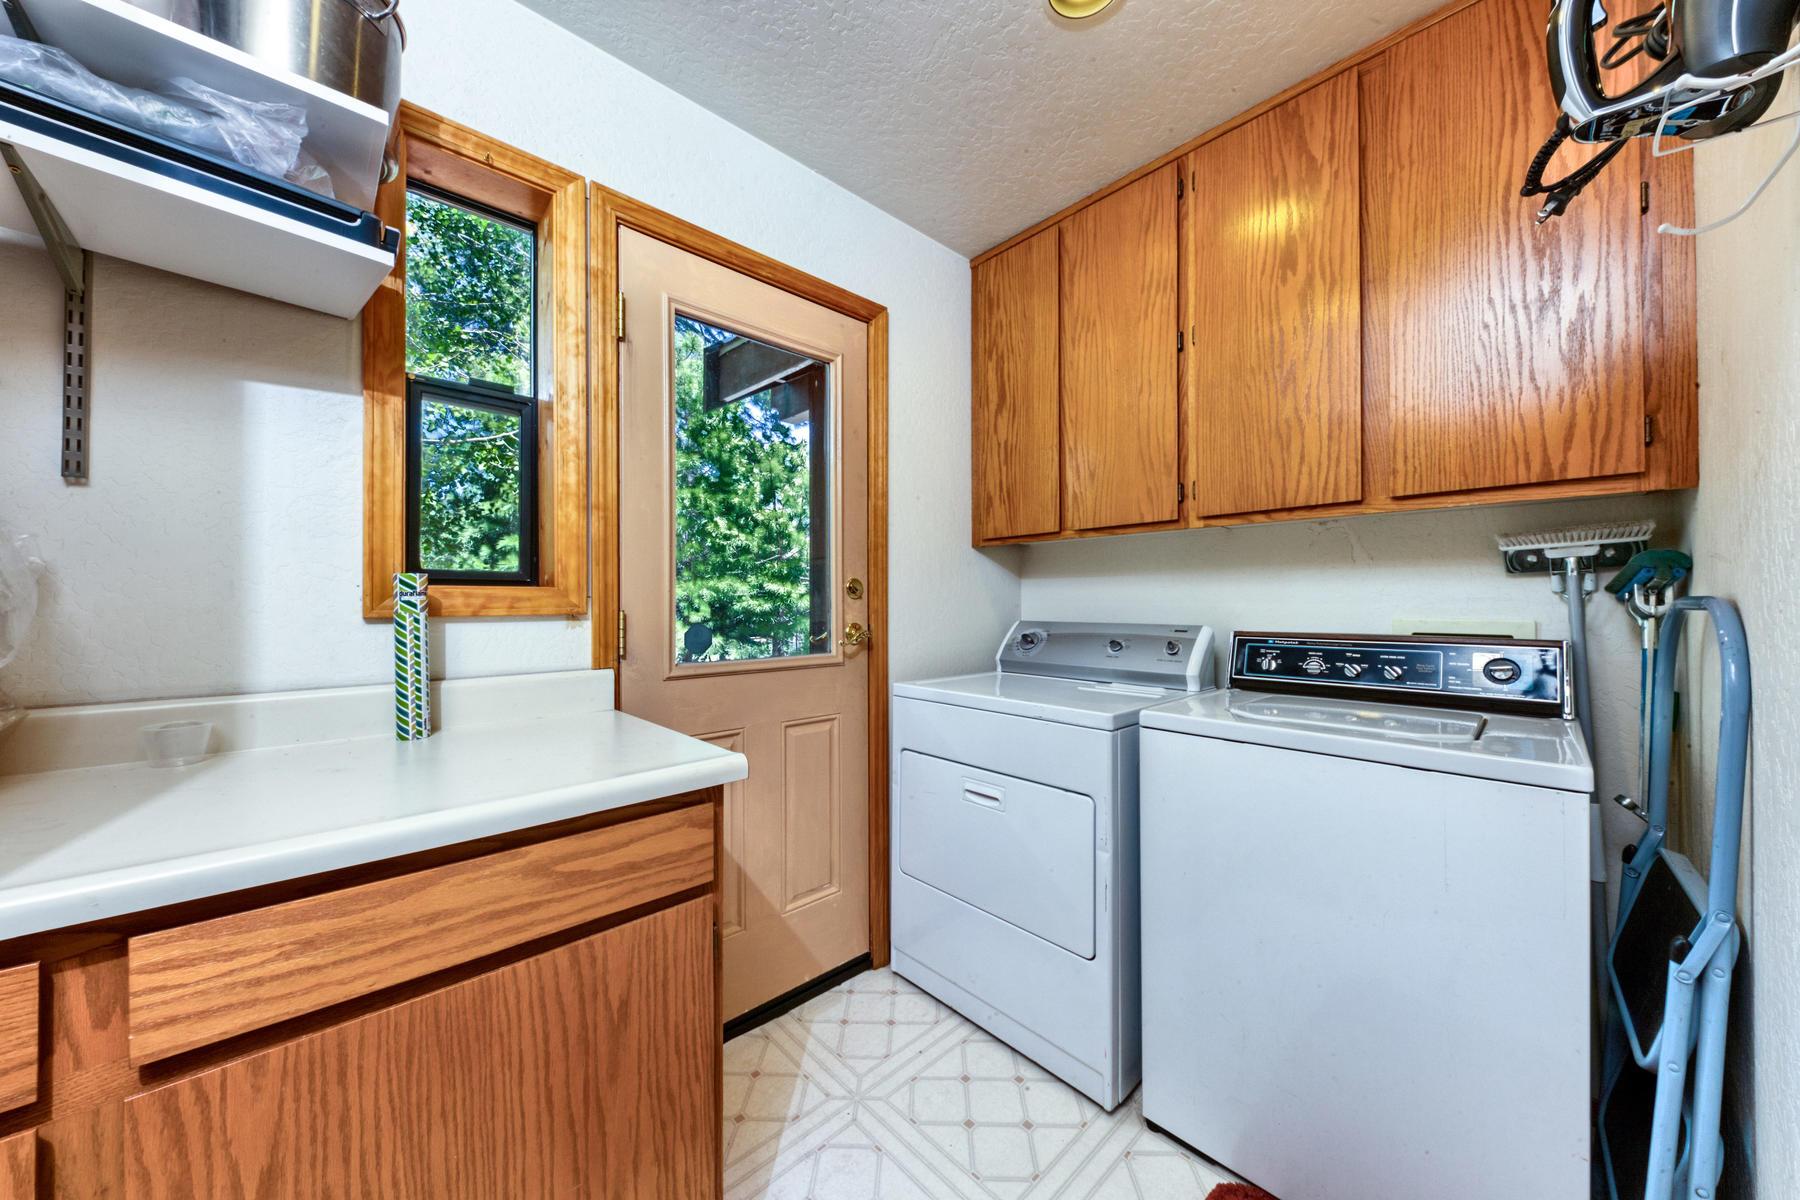 Additional photo for property listing at 11160 Thelin Drive, Truckee, CA 96161 11160 Thelin Drive Truckee, California 96161 Estados Unidos